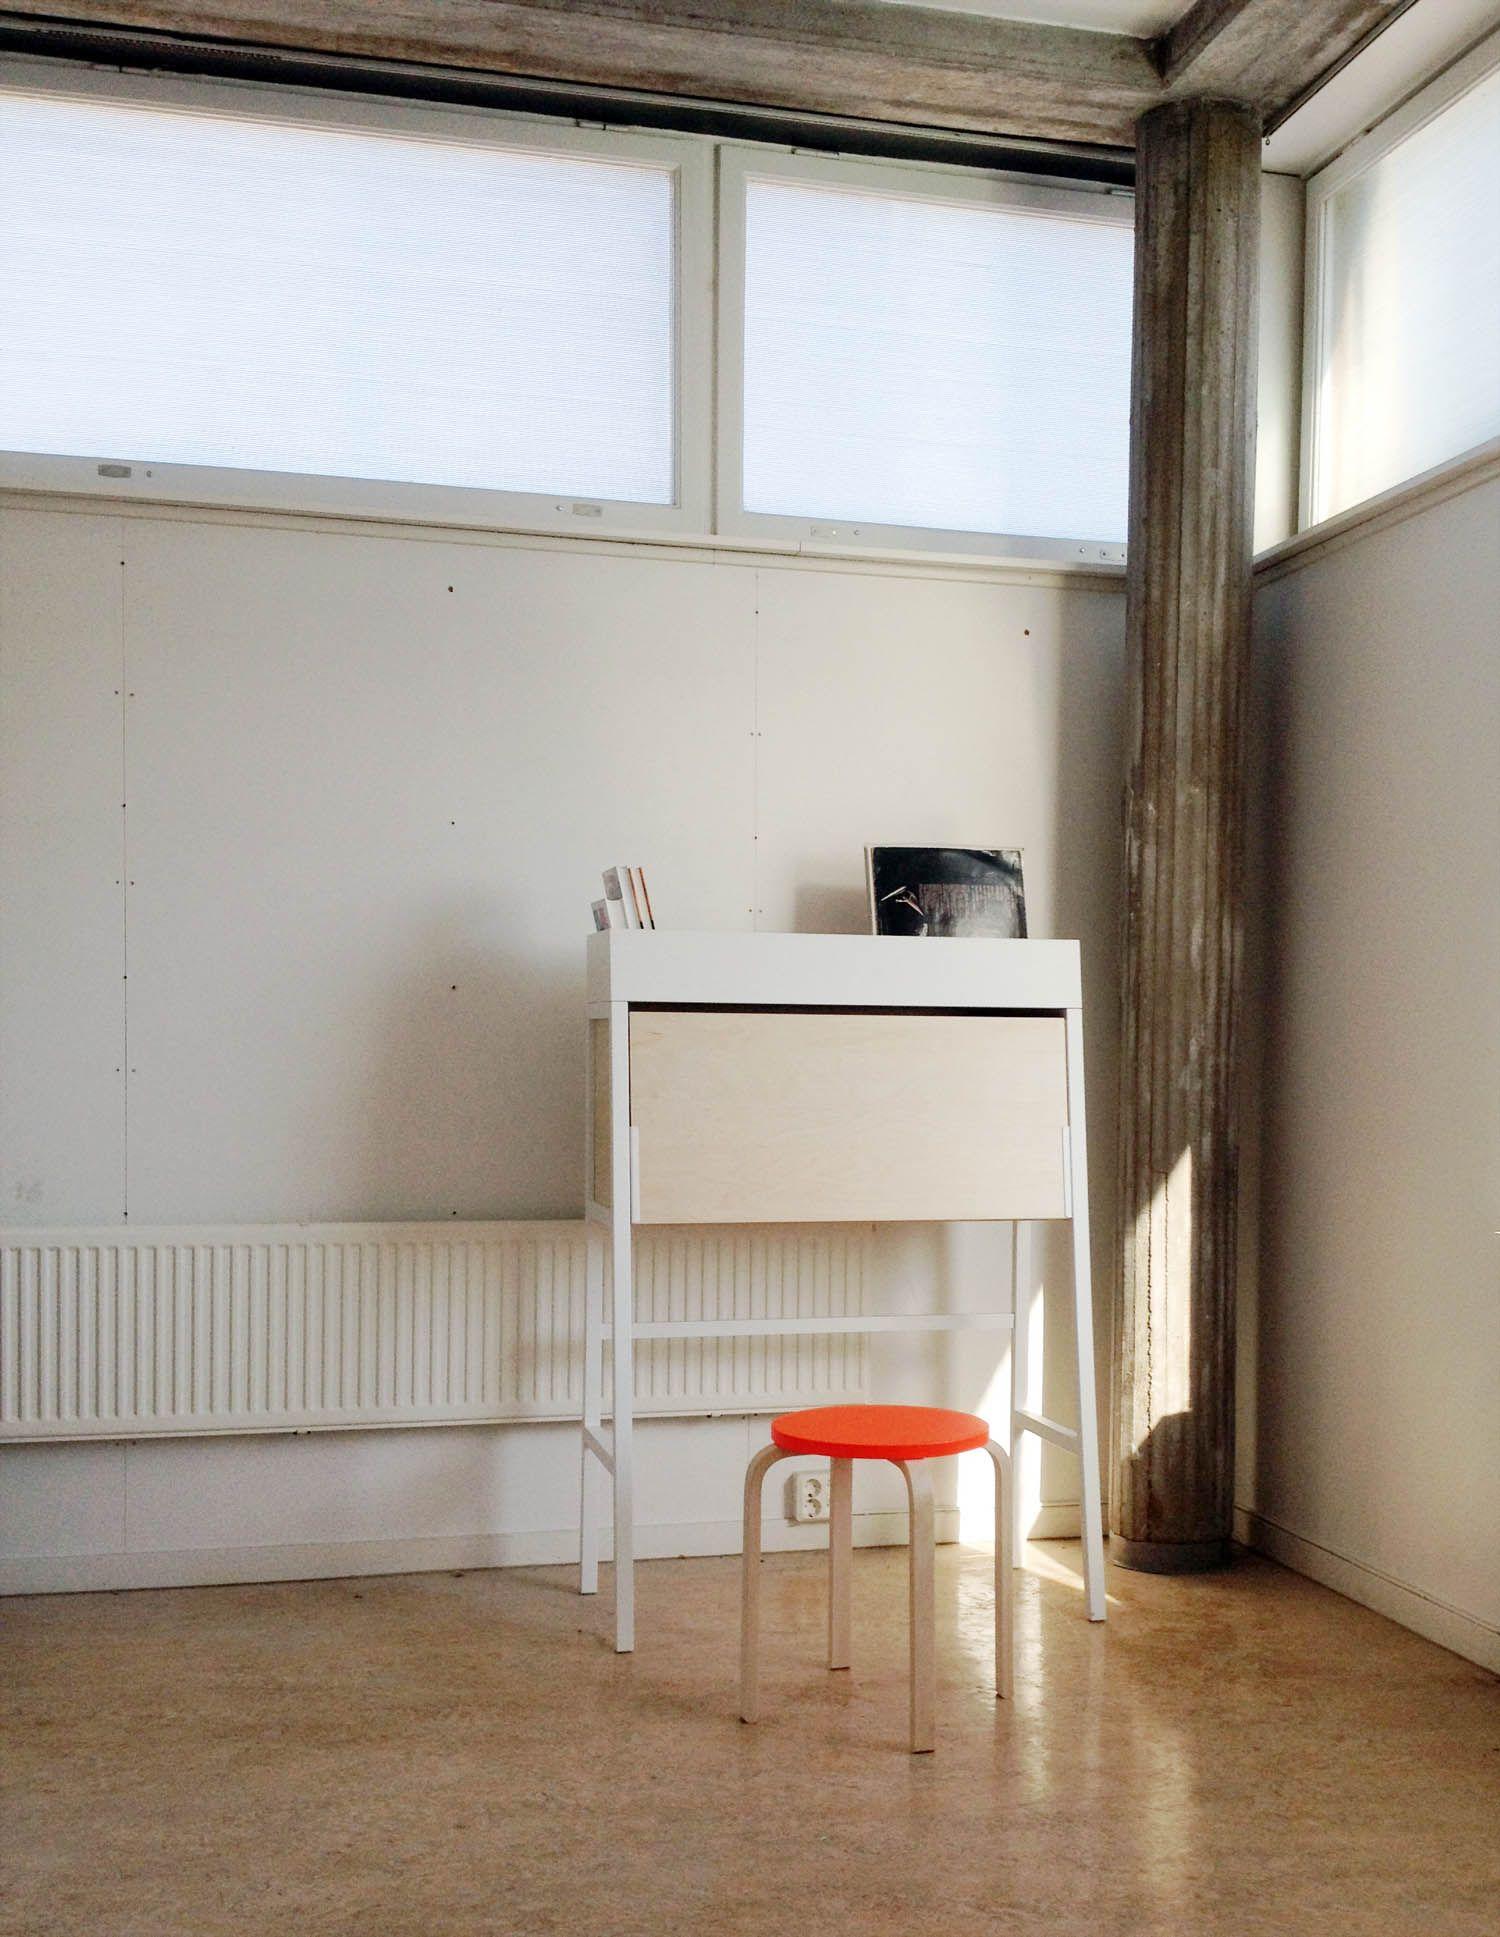 krystian kowalski industrial design bureau ikea ps. Black Bedroom Furniture Sets. Home Design Ideas